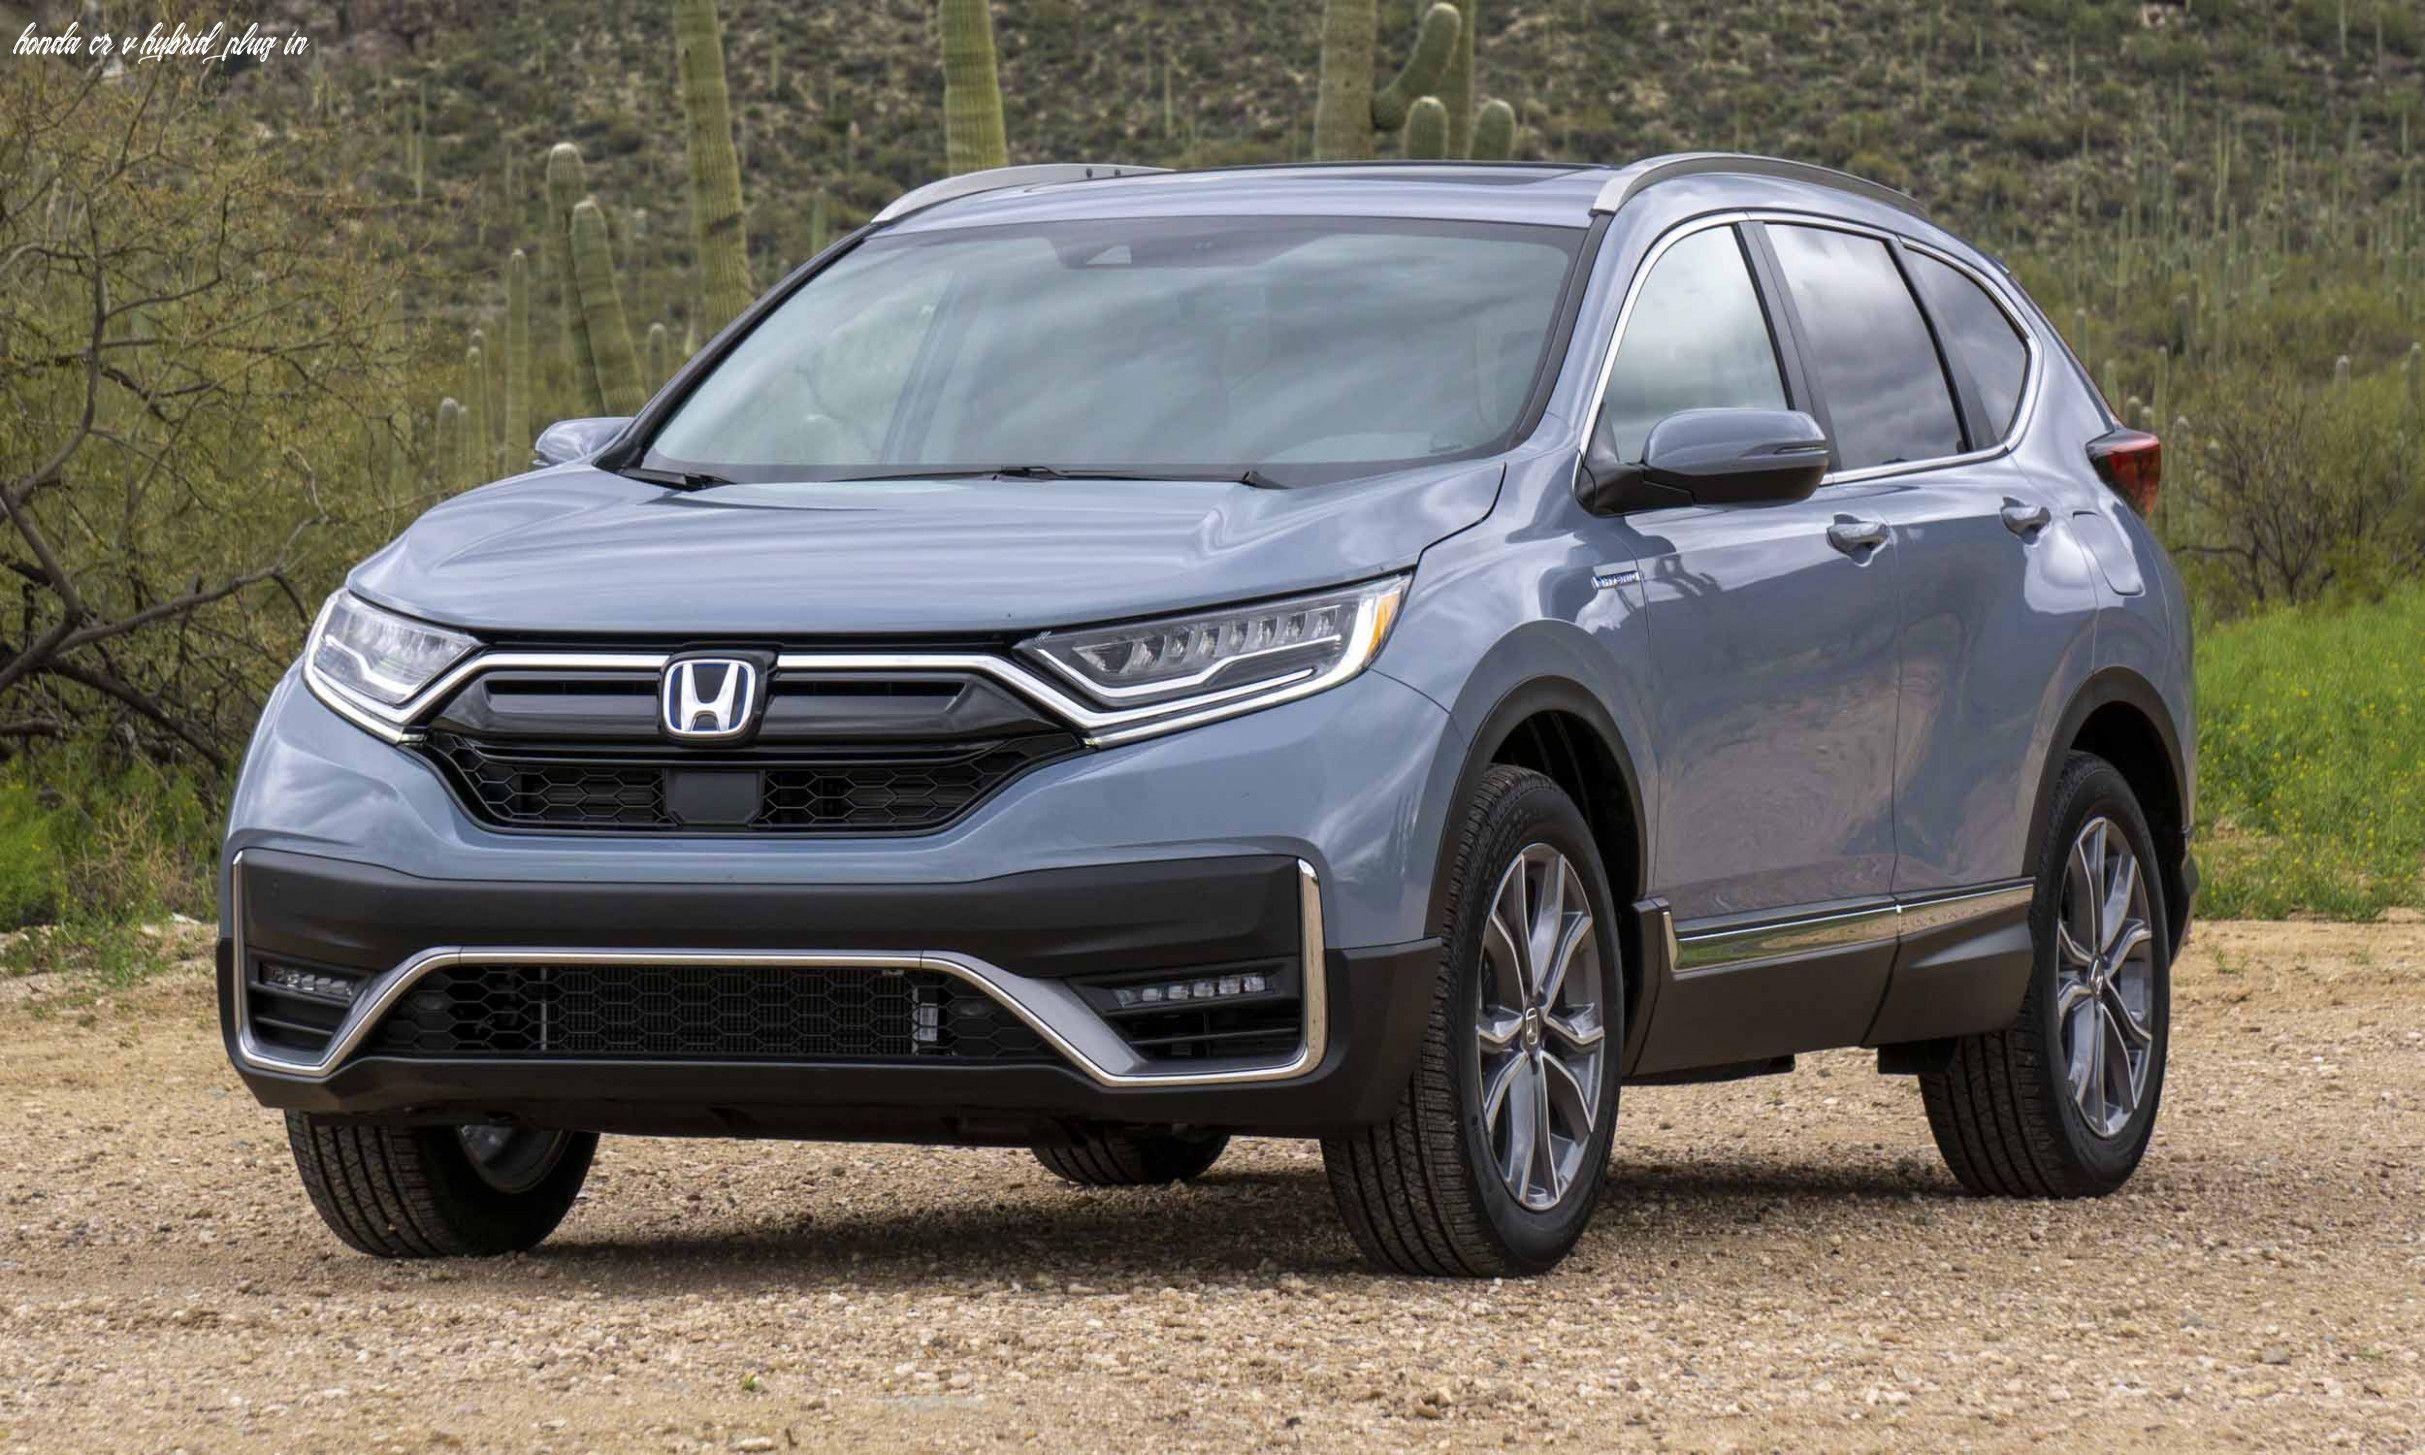 Honda Cr V Hybrid Plug In In 2020 Honda Crv Hybrid Honda Cr Honda Crv Exl